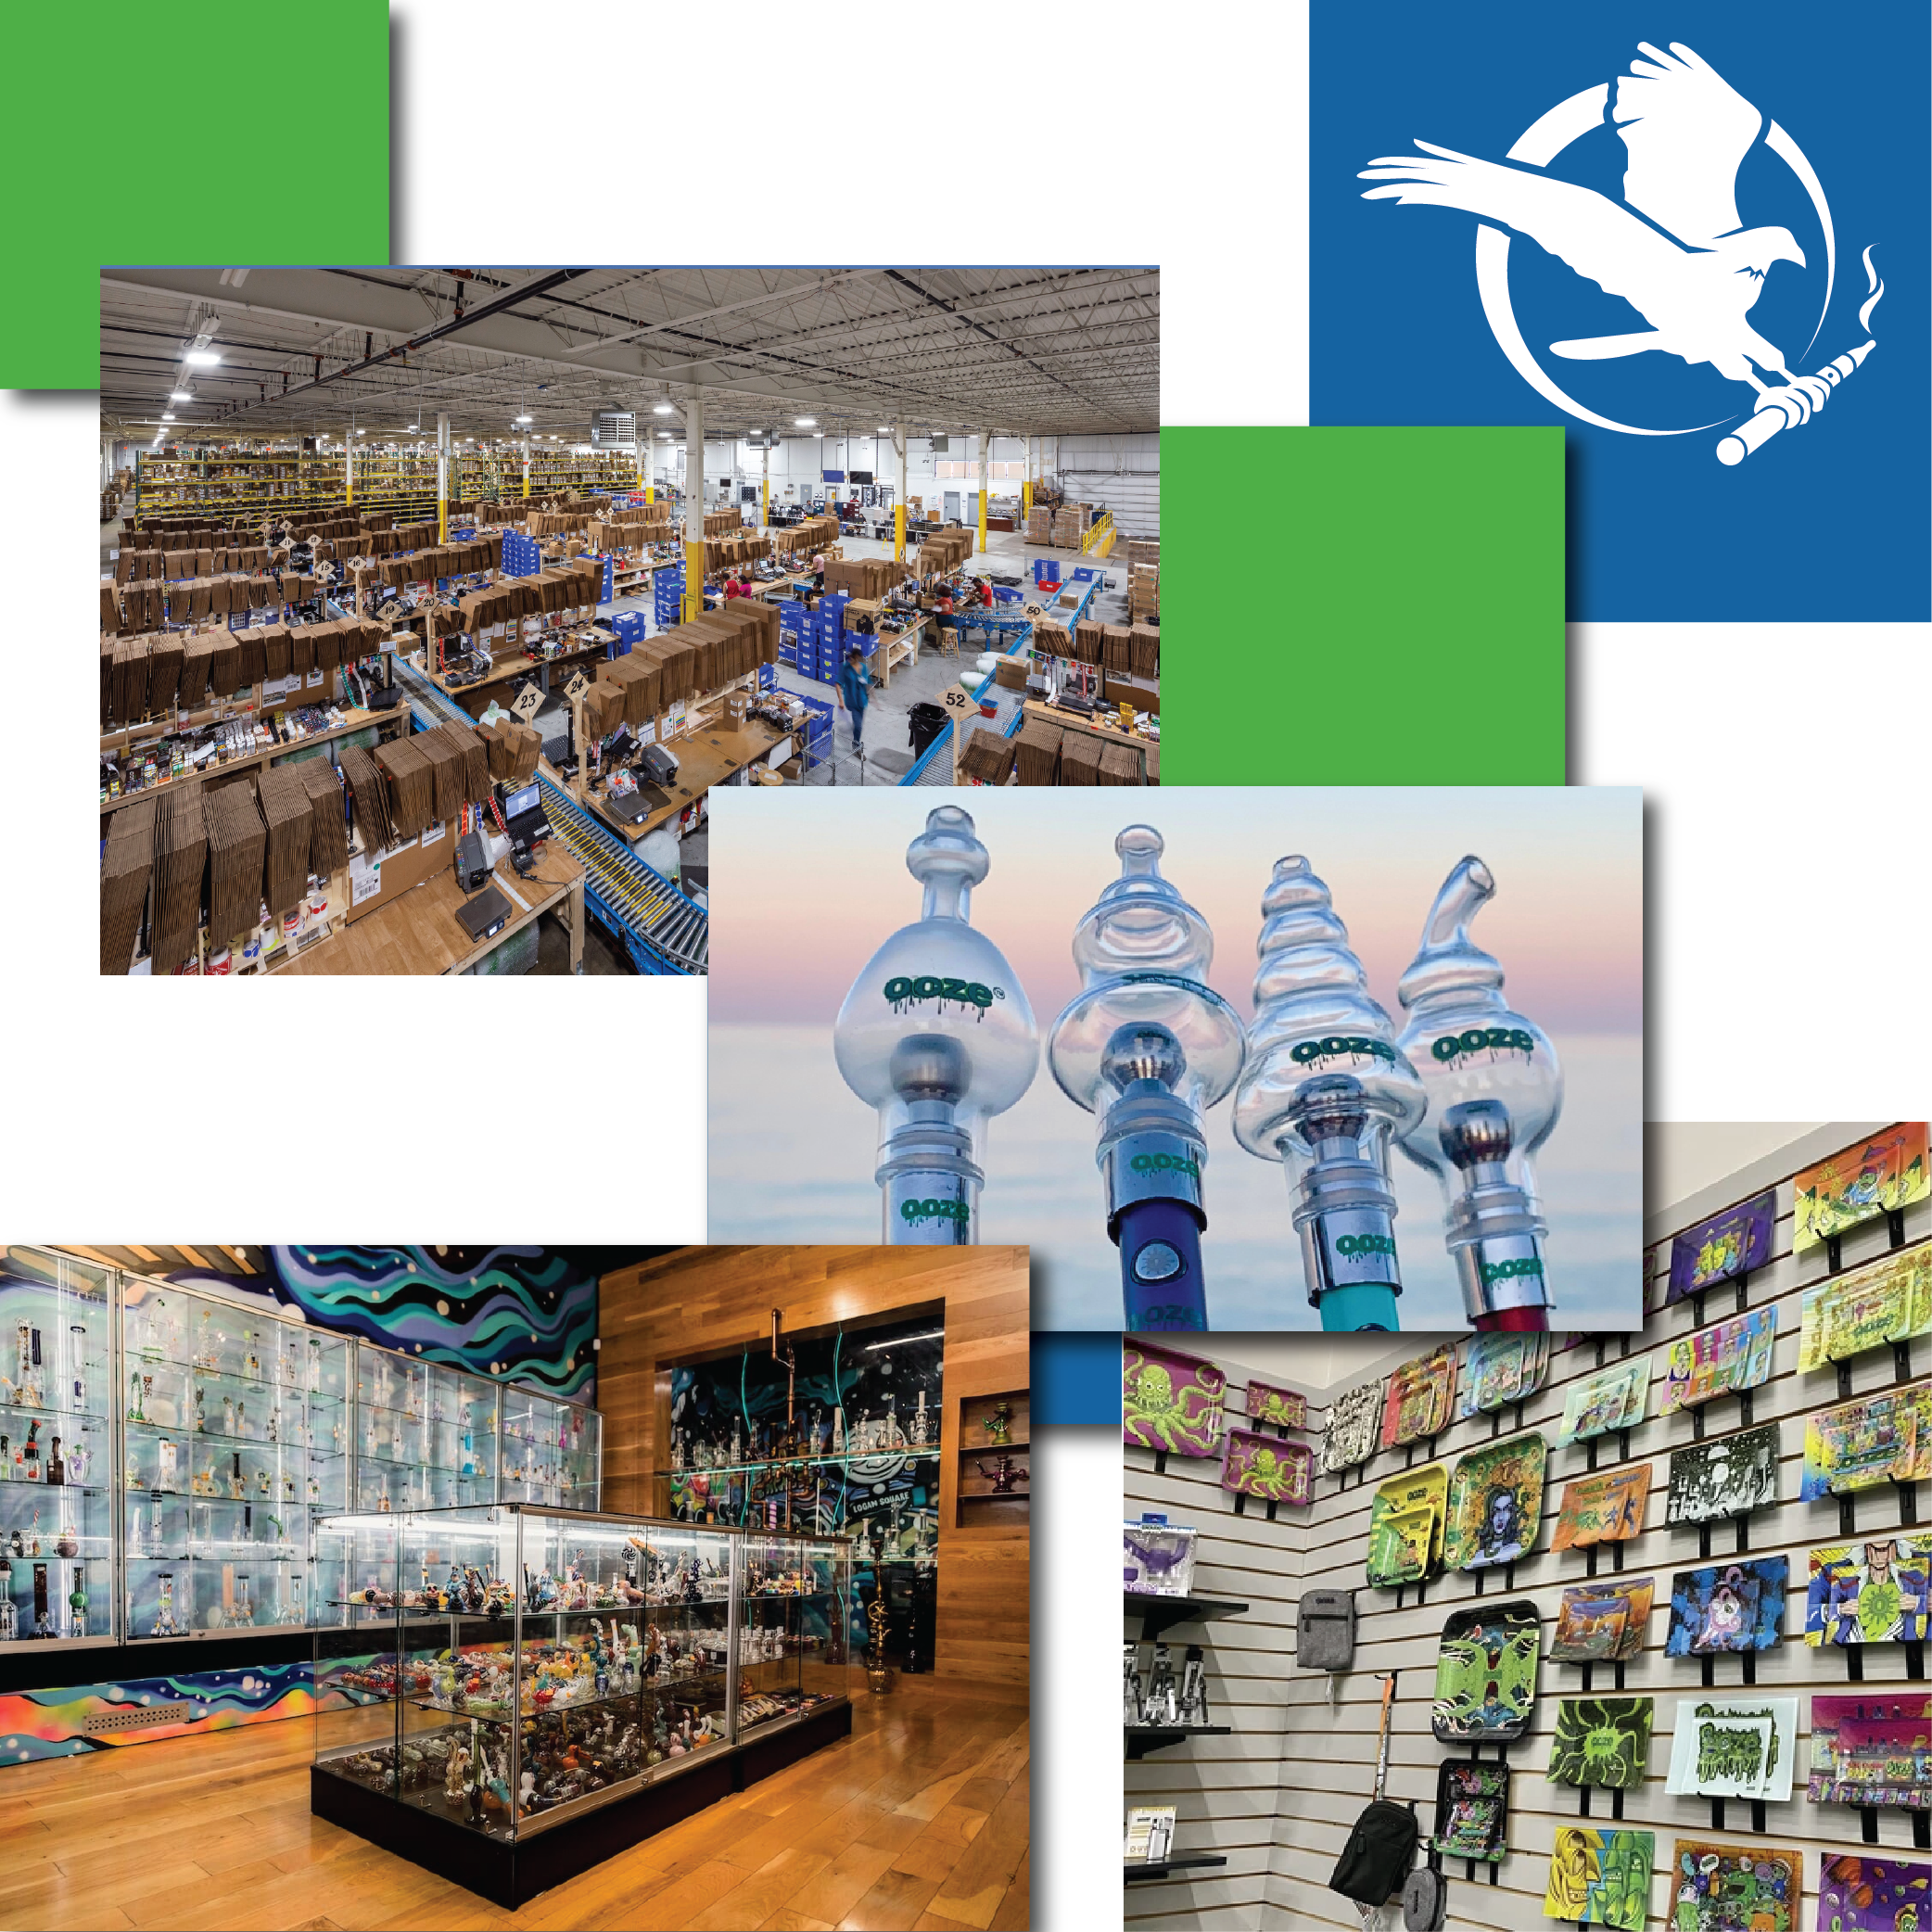 Wholesale Smoke Shop,Headshop, Dispensary Supply Midwest Goods Inc